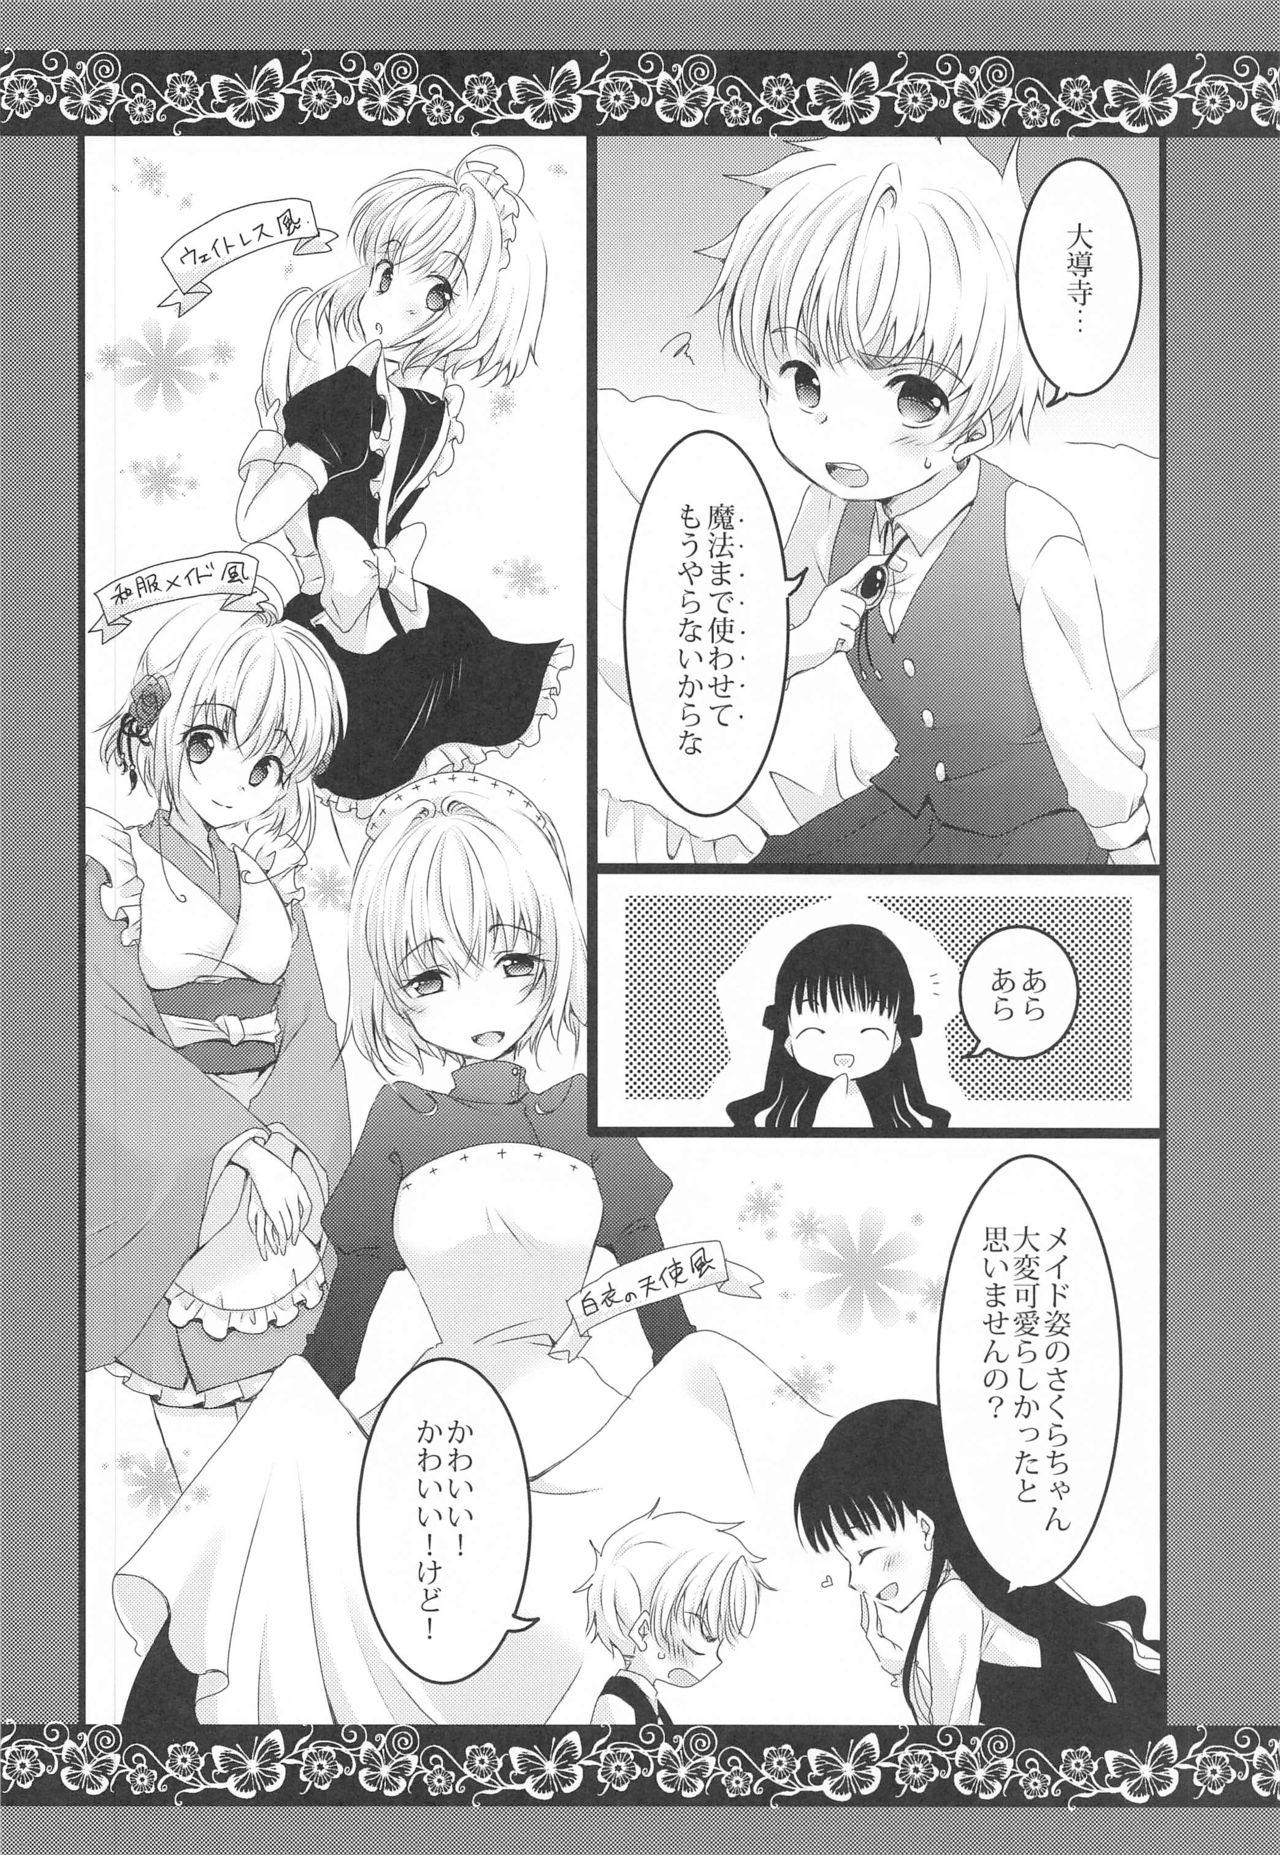 Maid to Goshujin-sama 6